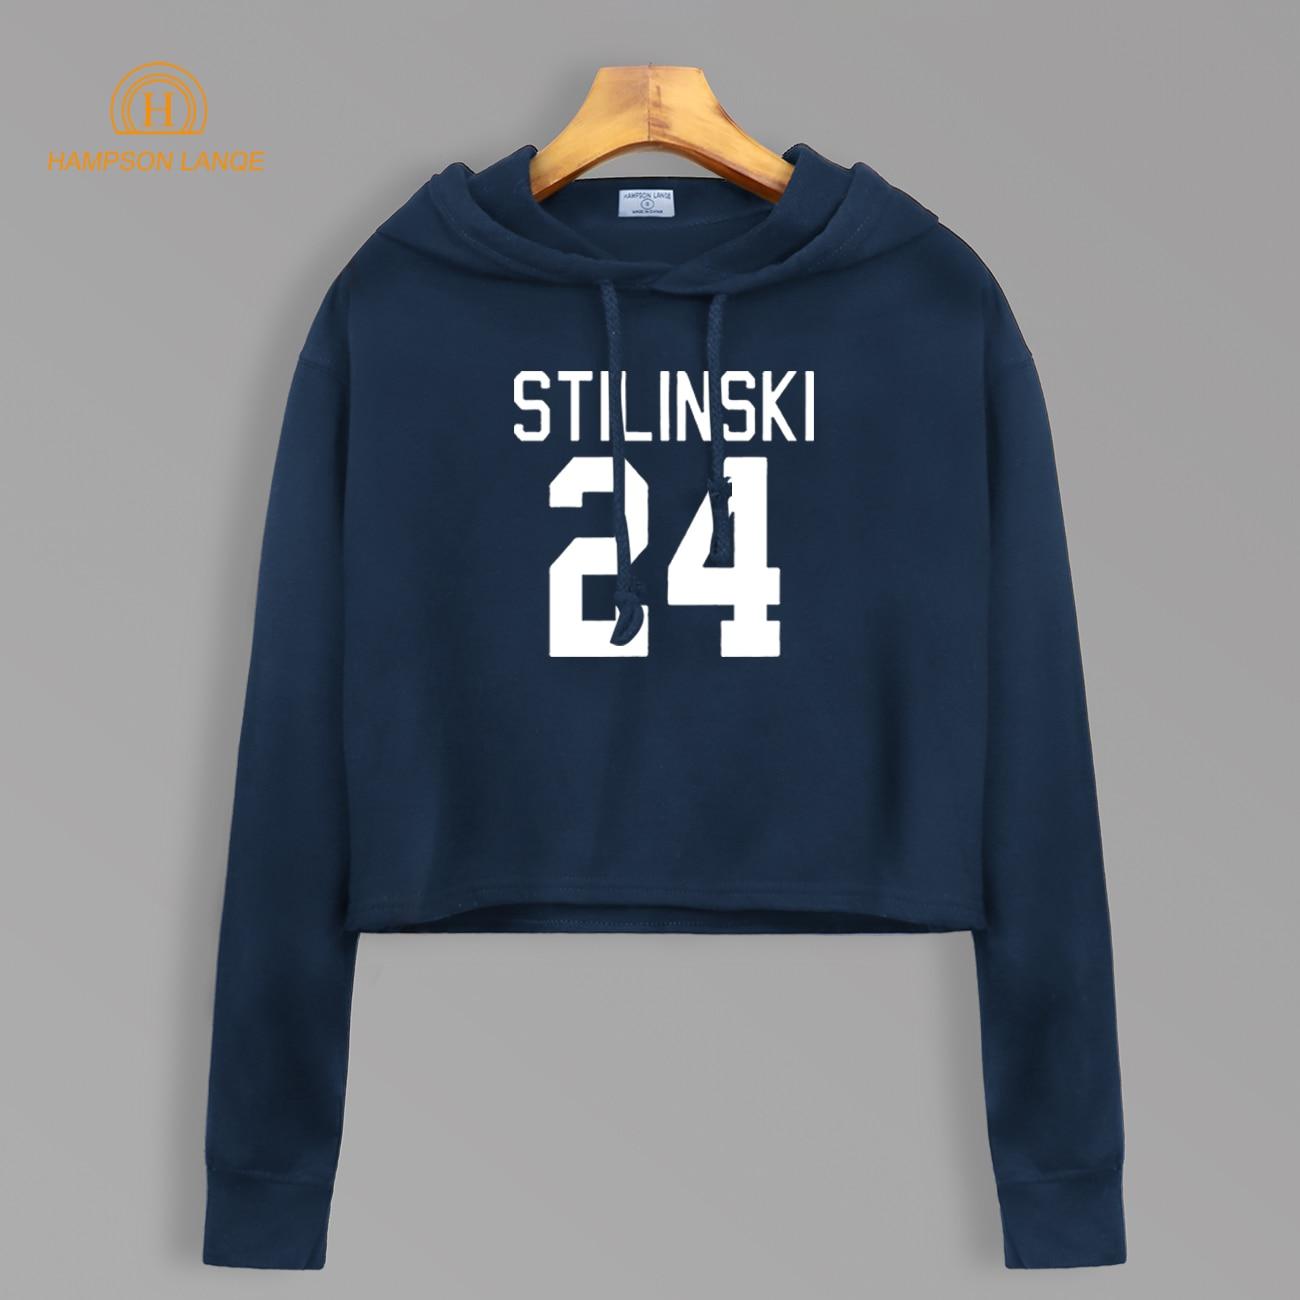 Teen Wolf Stilinski 24 Short Style Sweatshirt Autumn 2019 TV Show Women Kawaii Cotton Cropped Hoodie Sexy Pullovers For Fans